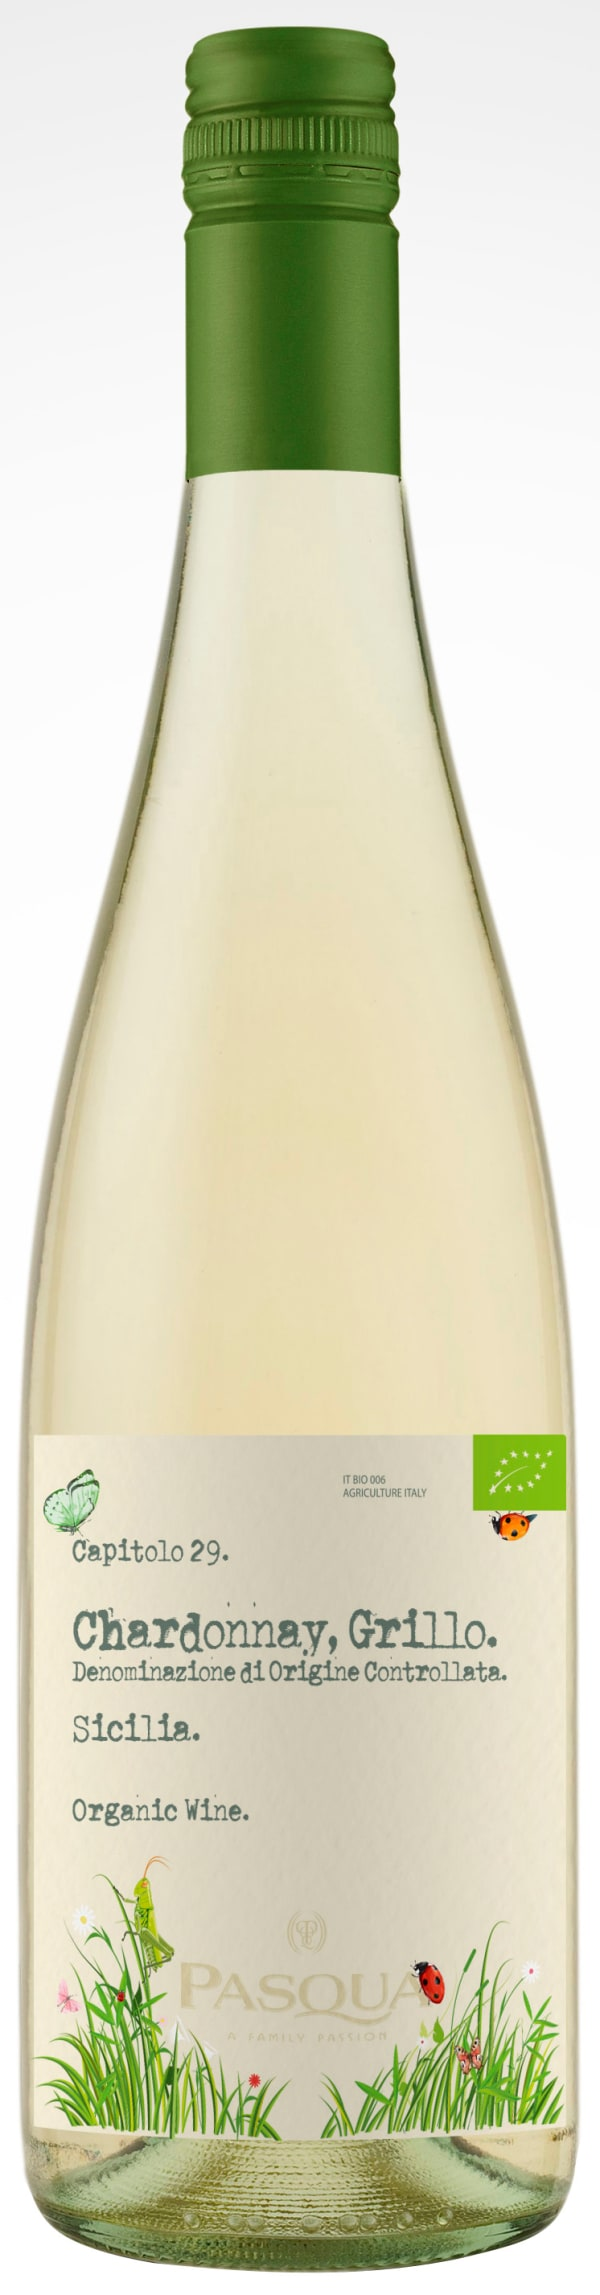 Pasqua Chardonnay Grillo Organic 2017